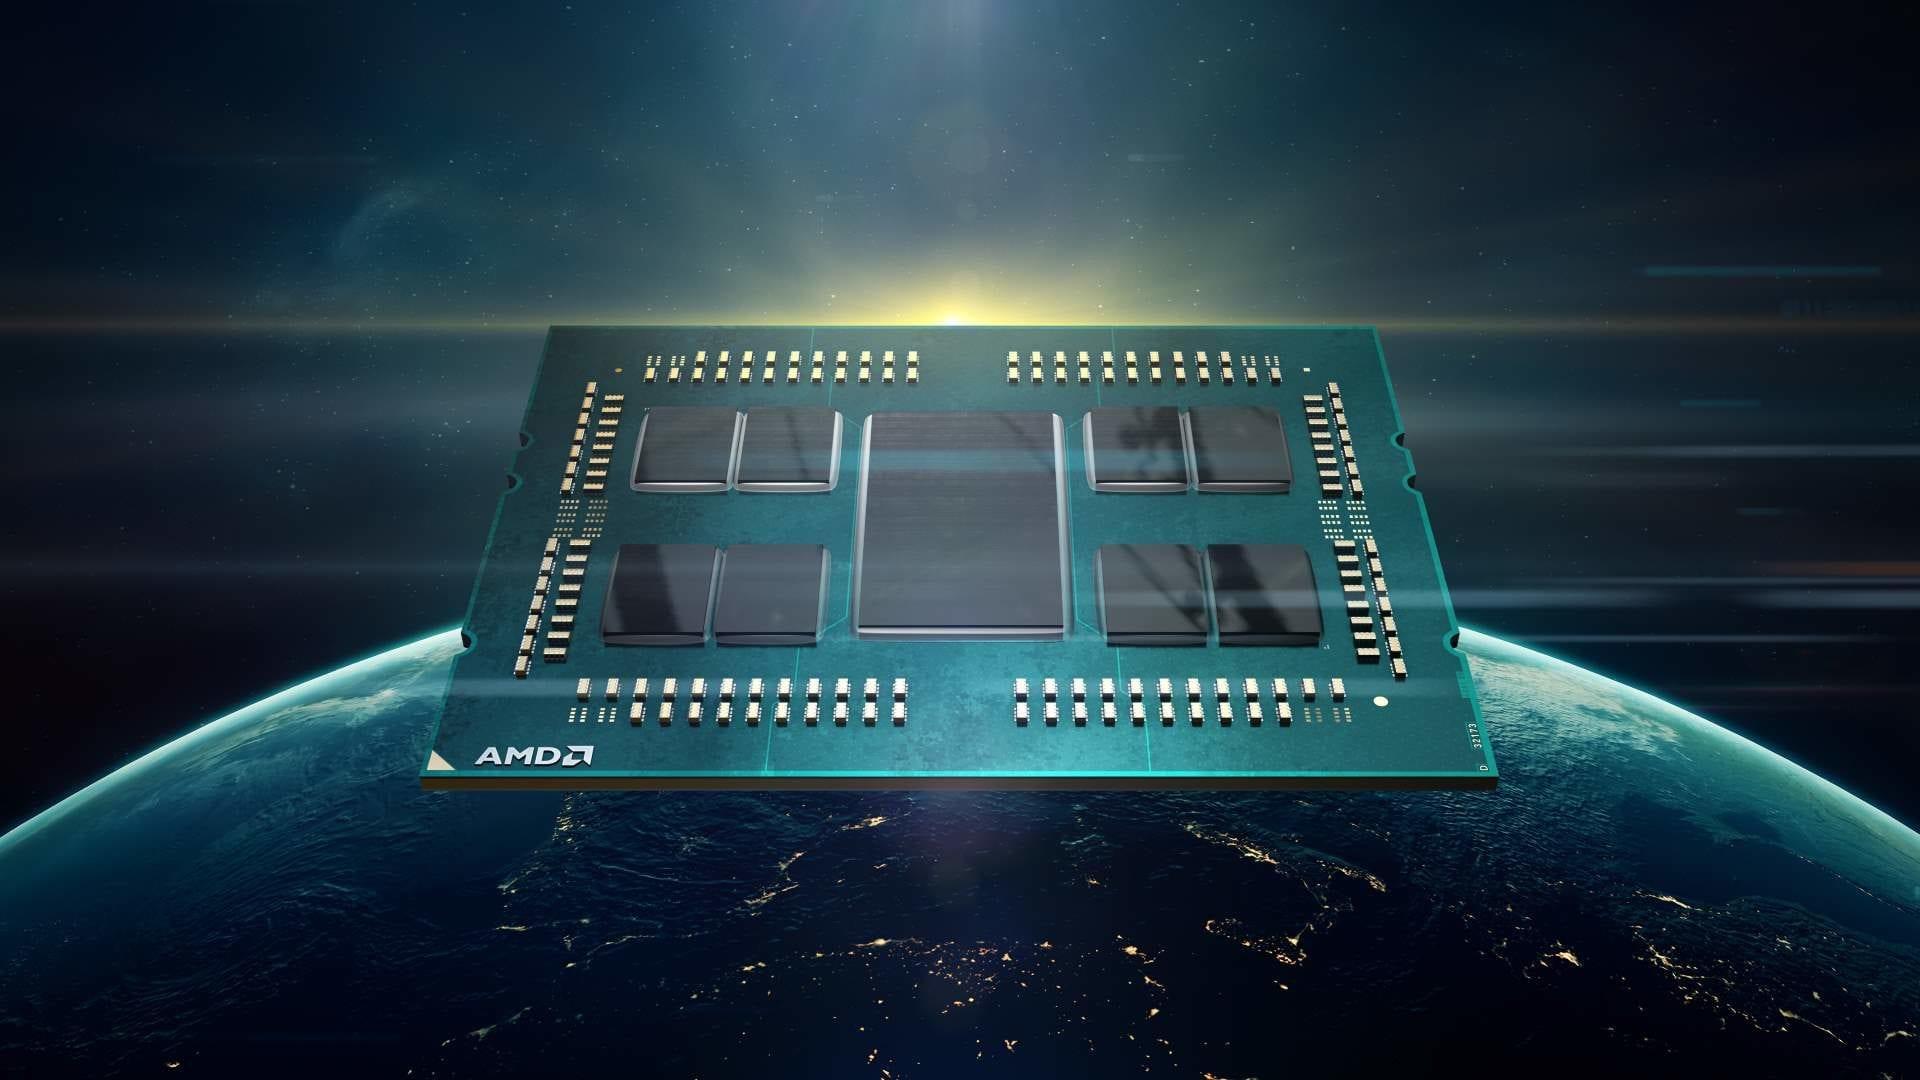 Два процессора AMD Epyc 7742: Bruno установил абсолютный рекорд в Cinebench R15 и HWBOT x265 Benchmark